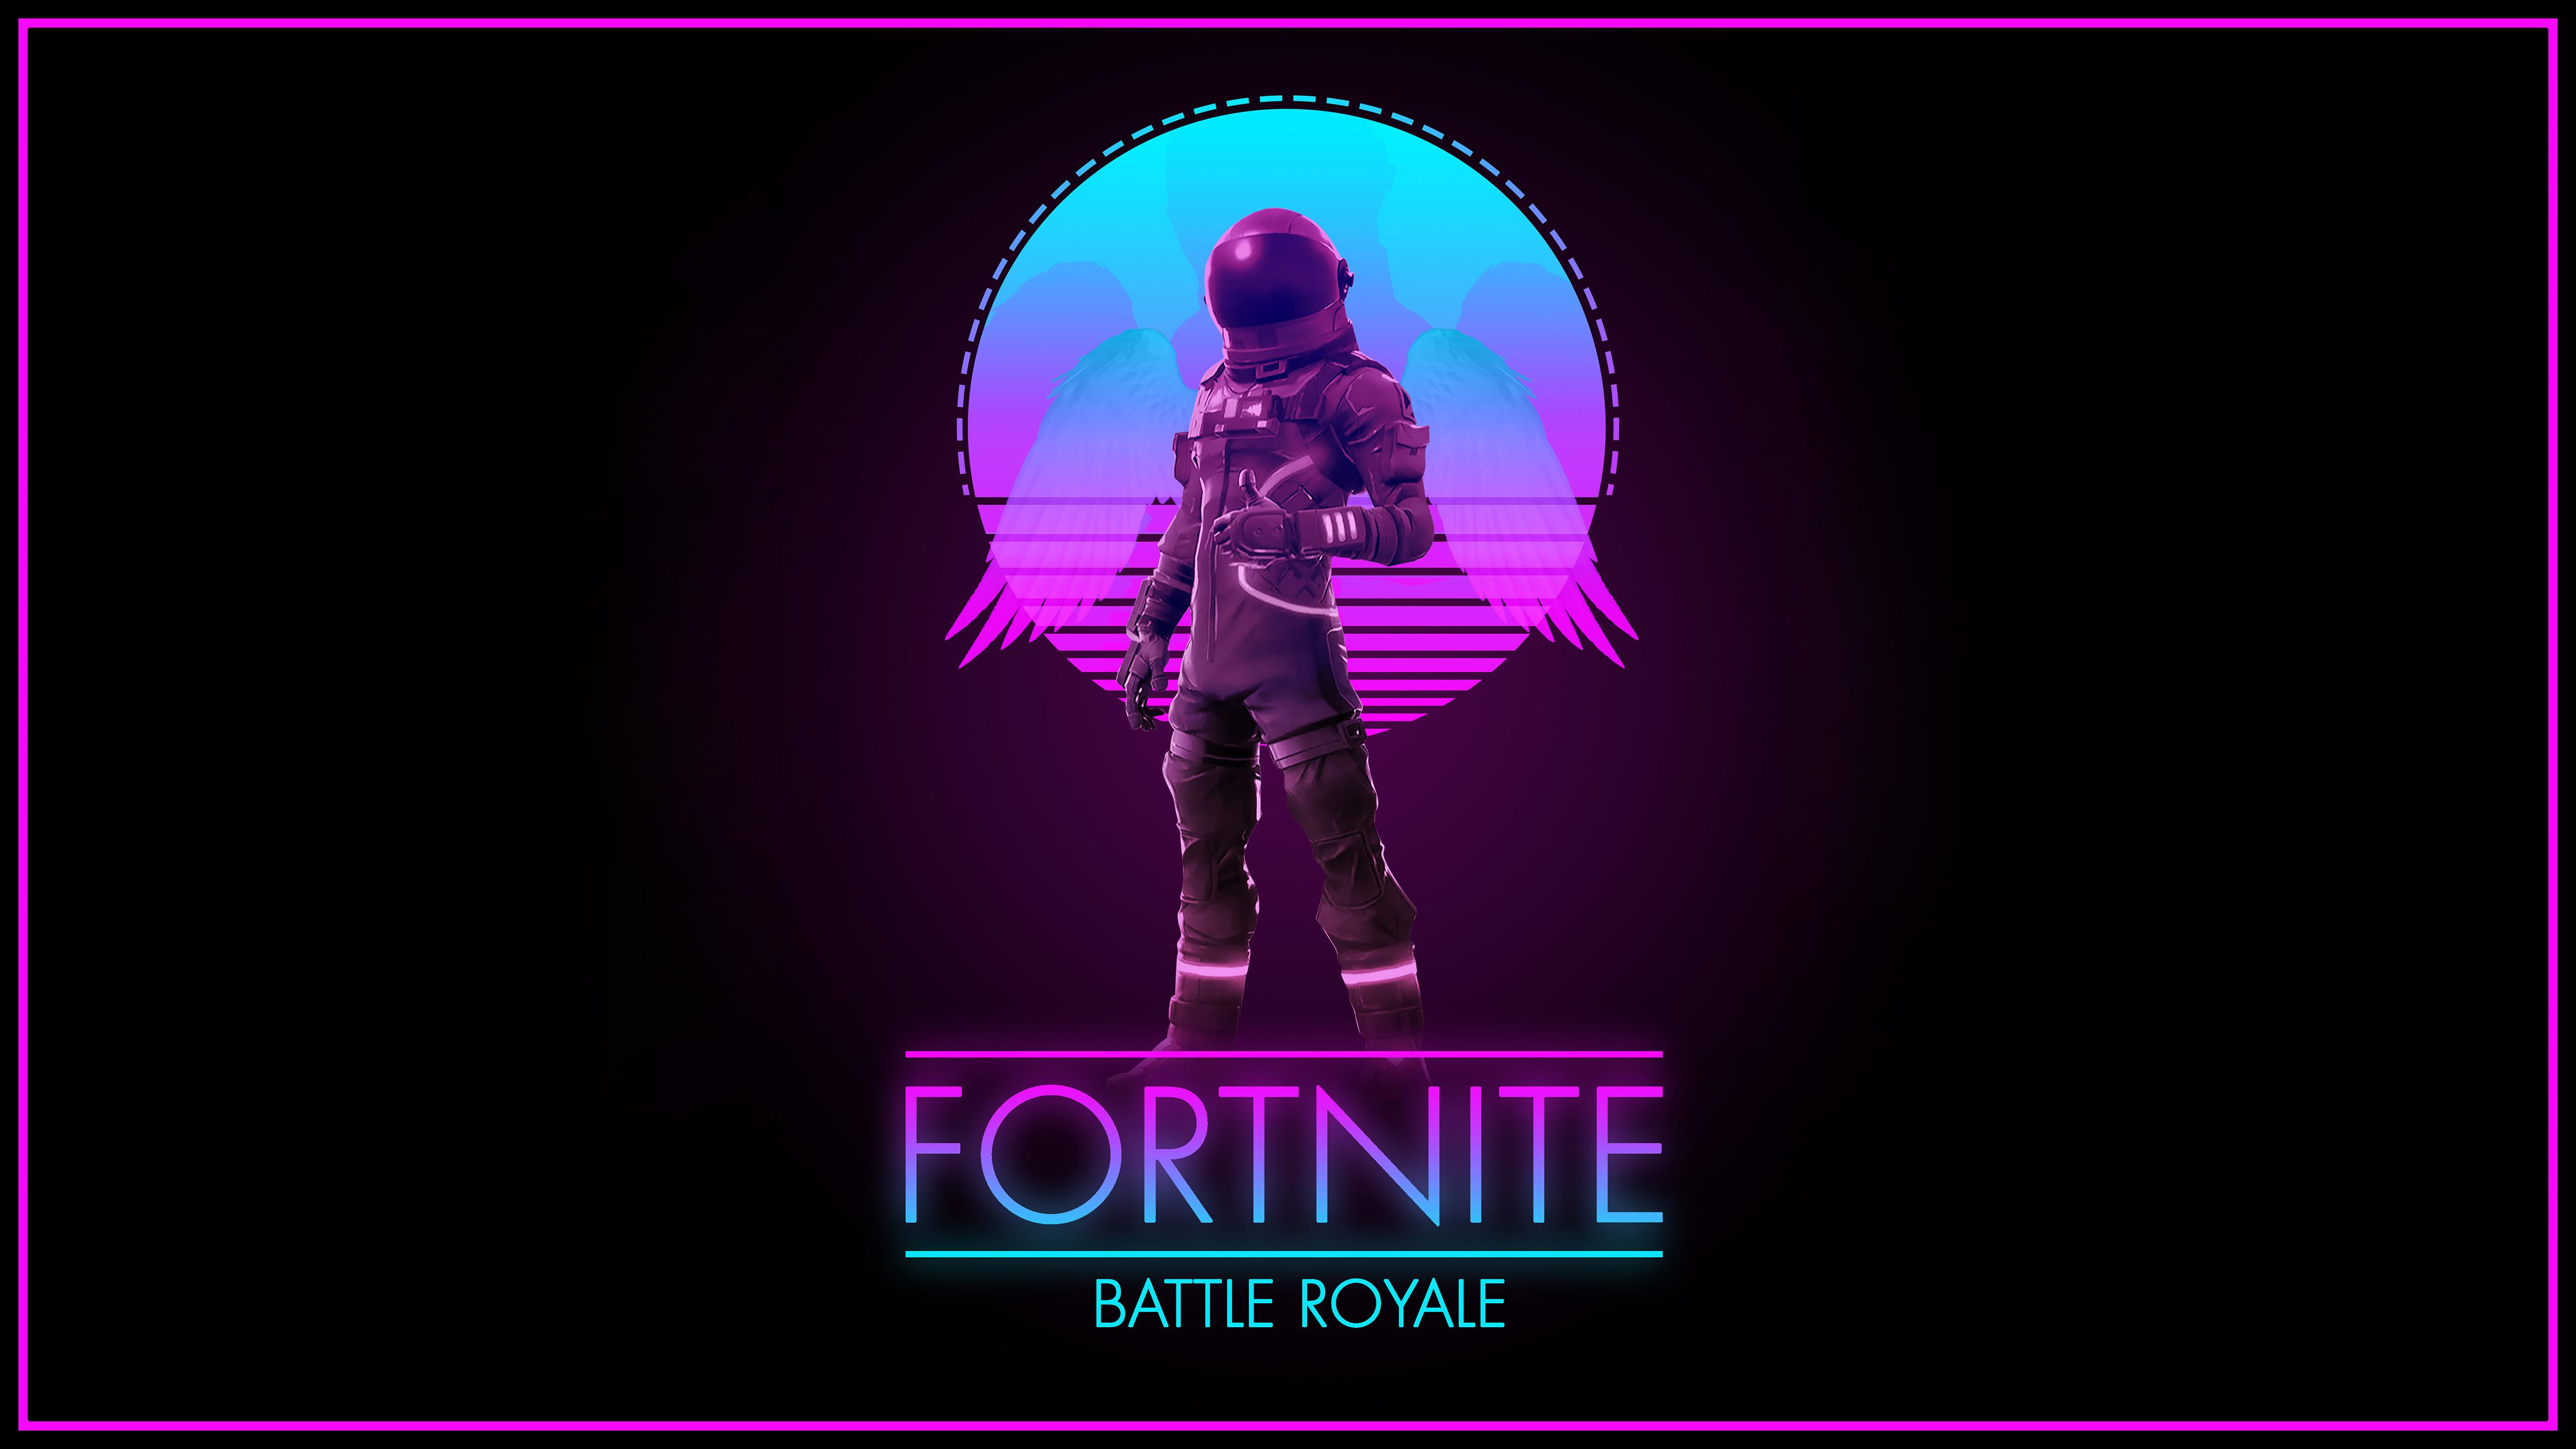 Fortnite Battle Royale Hd Wallpaper   4740x2666   Gludy